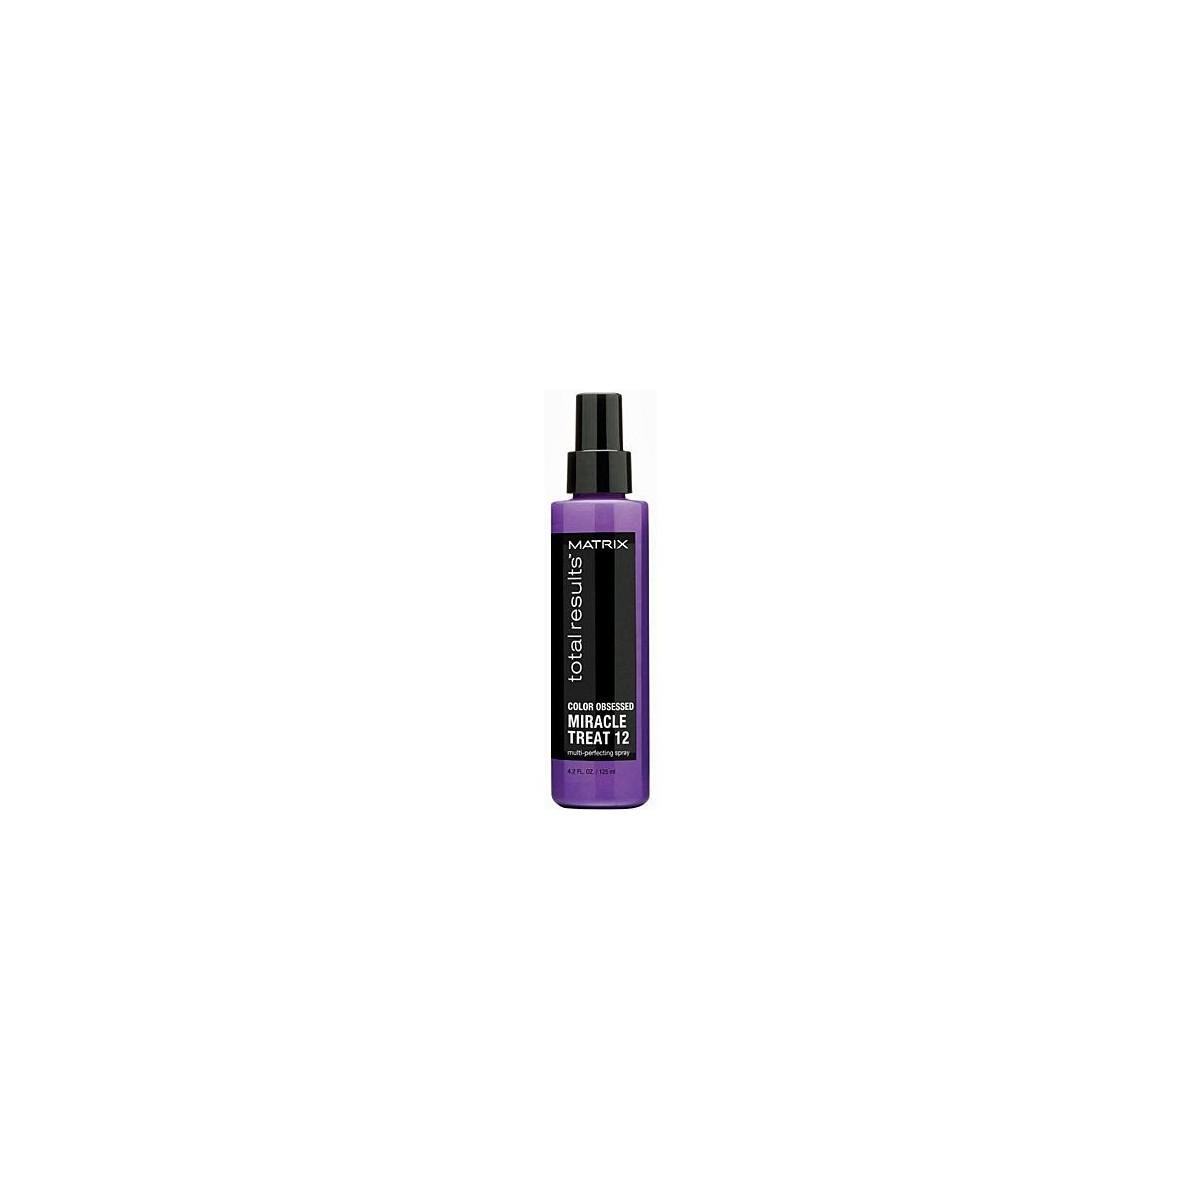 Matrix Color Obsessed Miracle Treat 12, ochronny spray do włosów 125ml